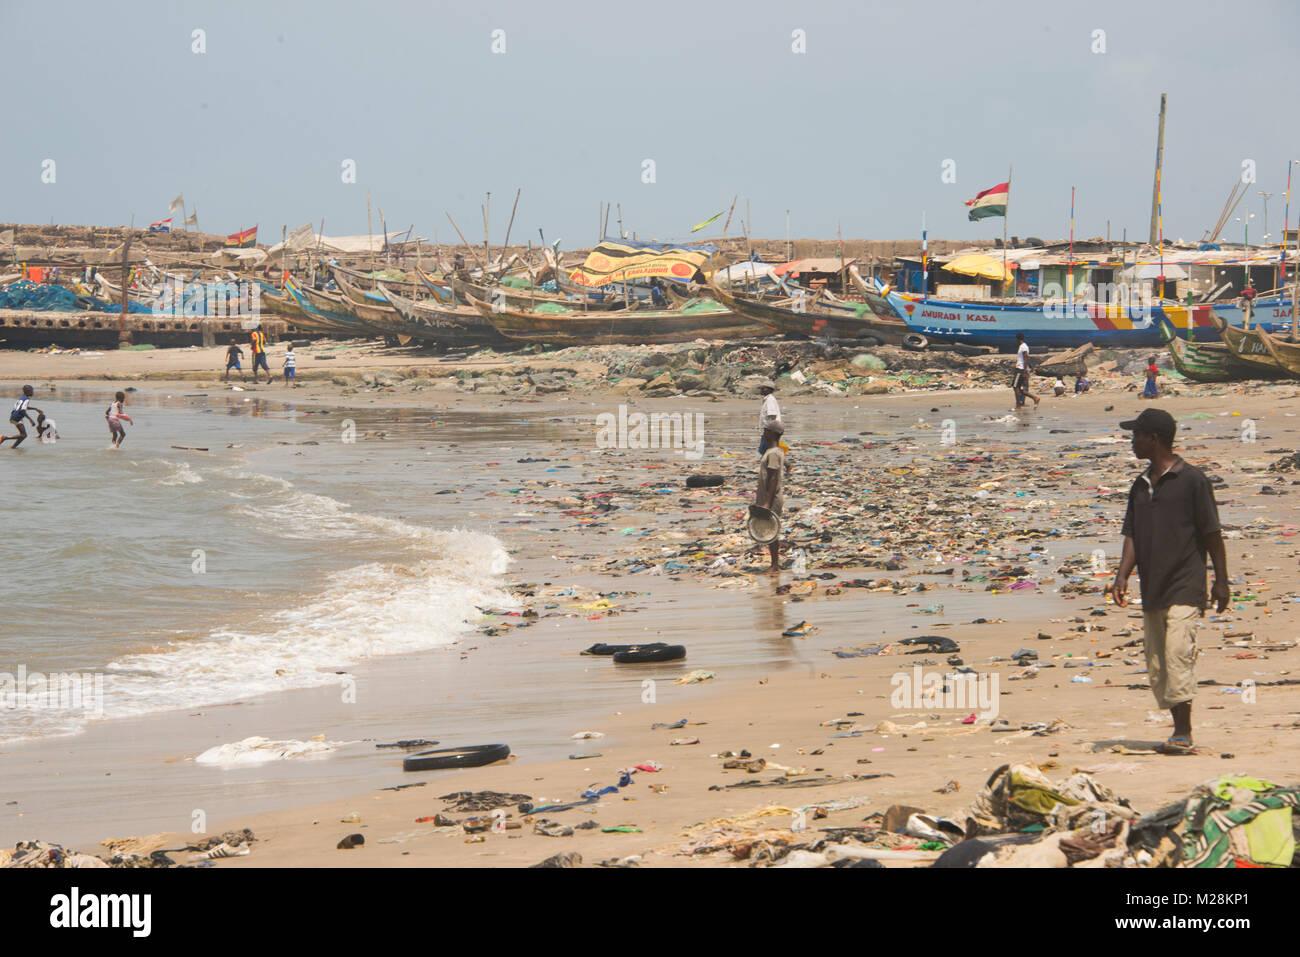 Dirty beach in Jamestown, Accra, Ghana - Stock Image